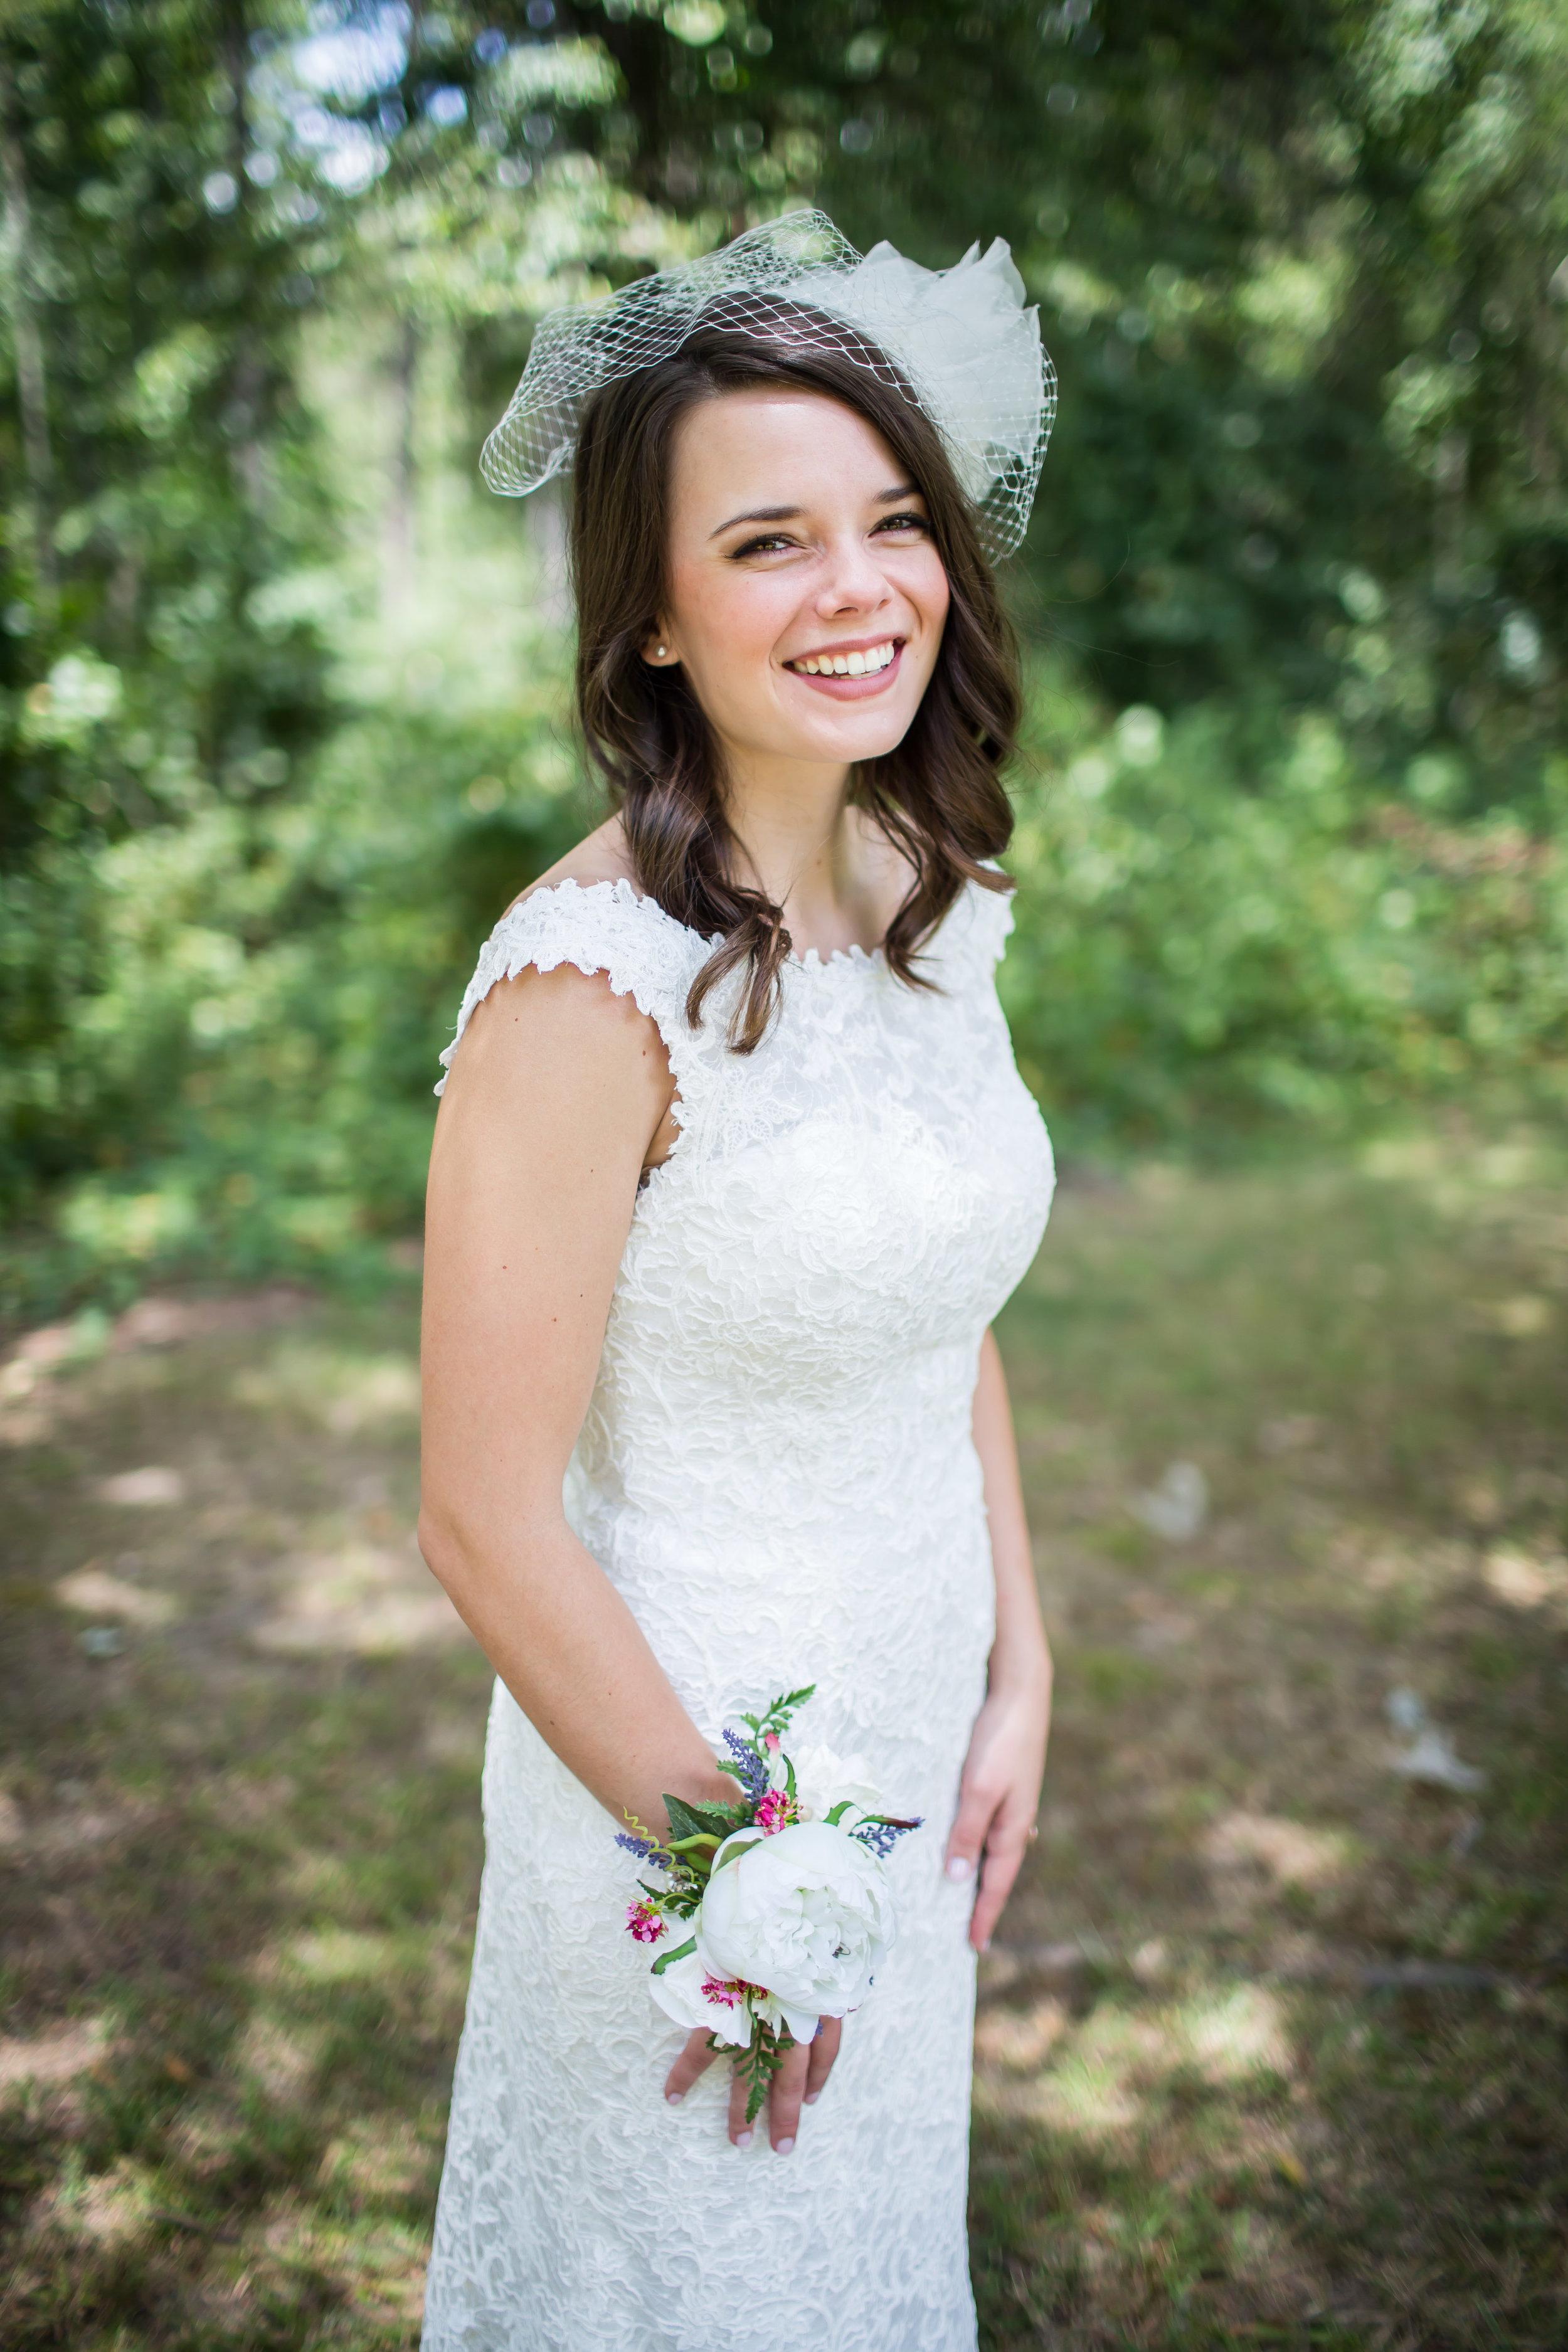 wedding (2 of 5).jpg